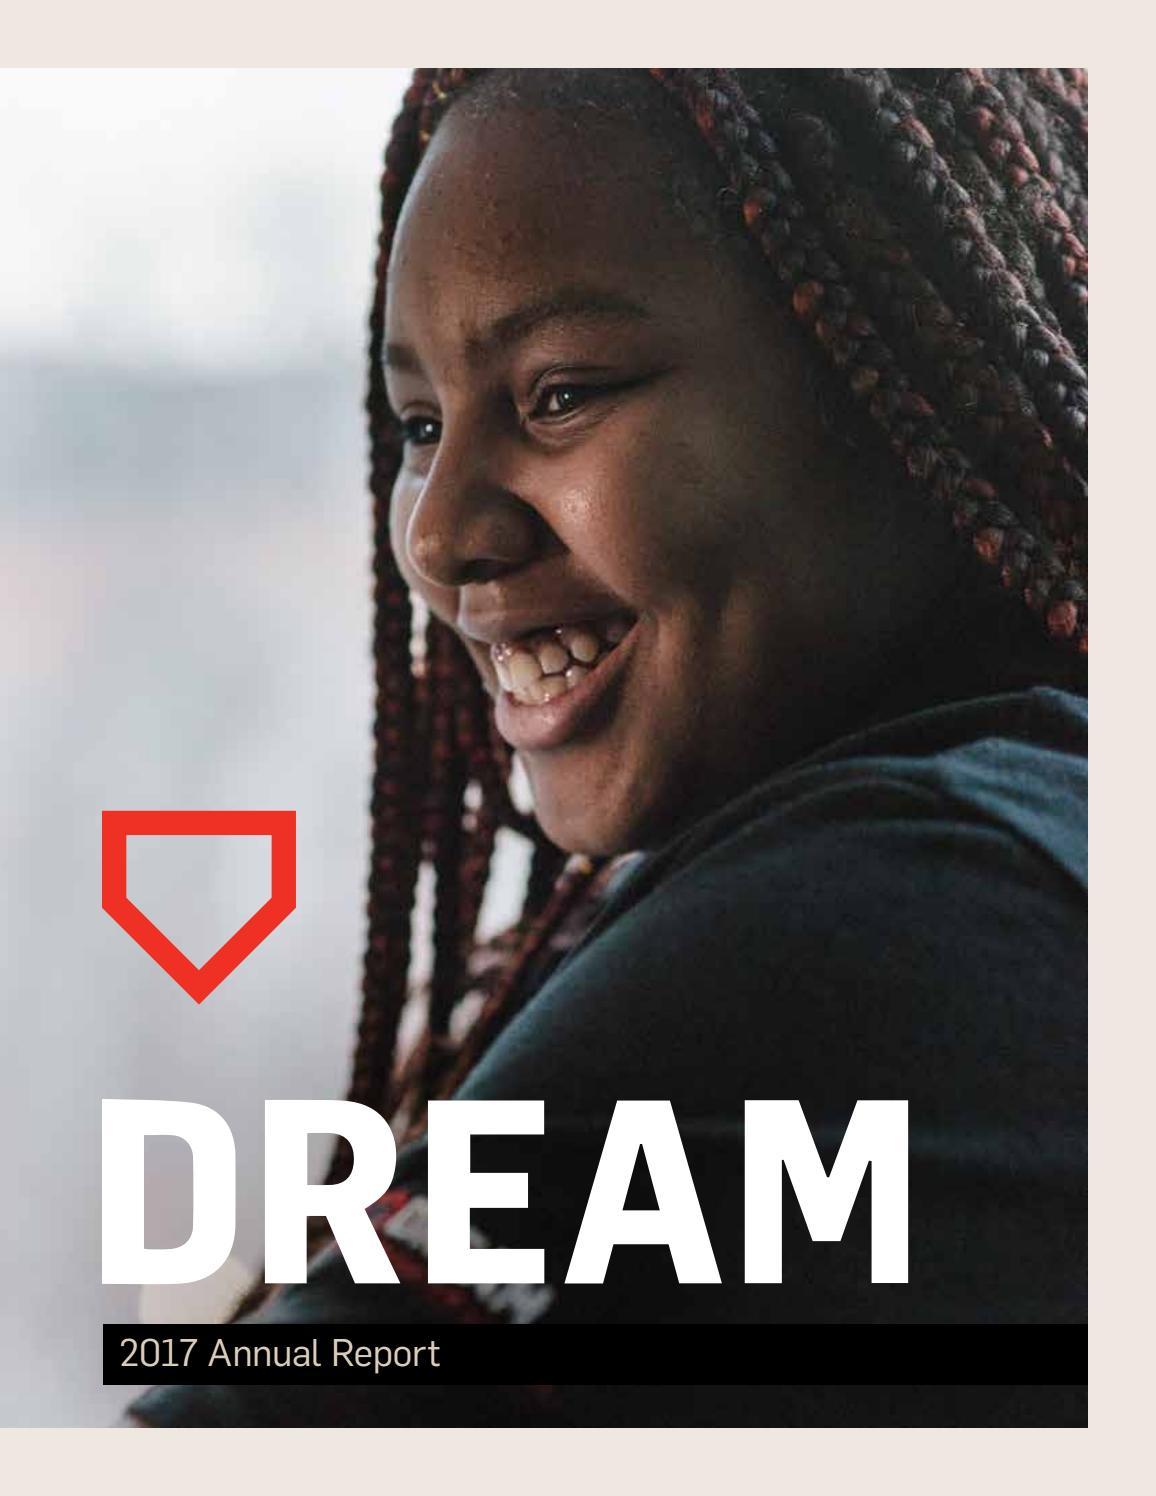 Dream 2017 Annual Report by DREAM - issuu